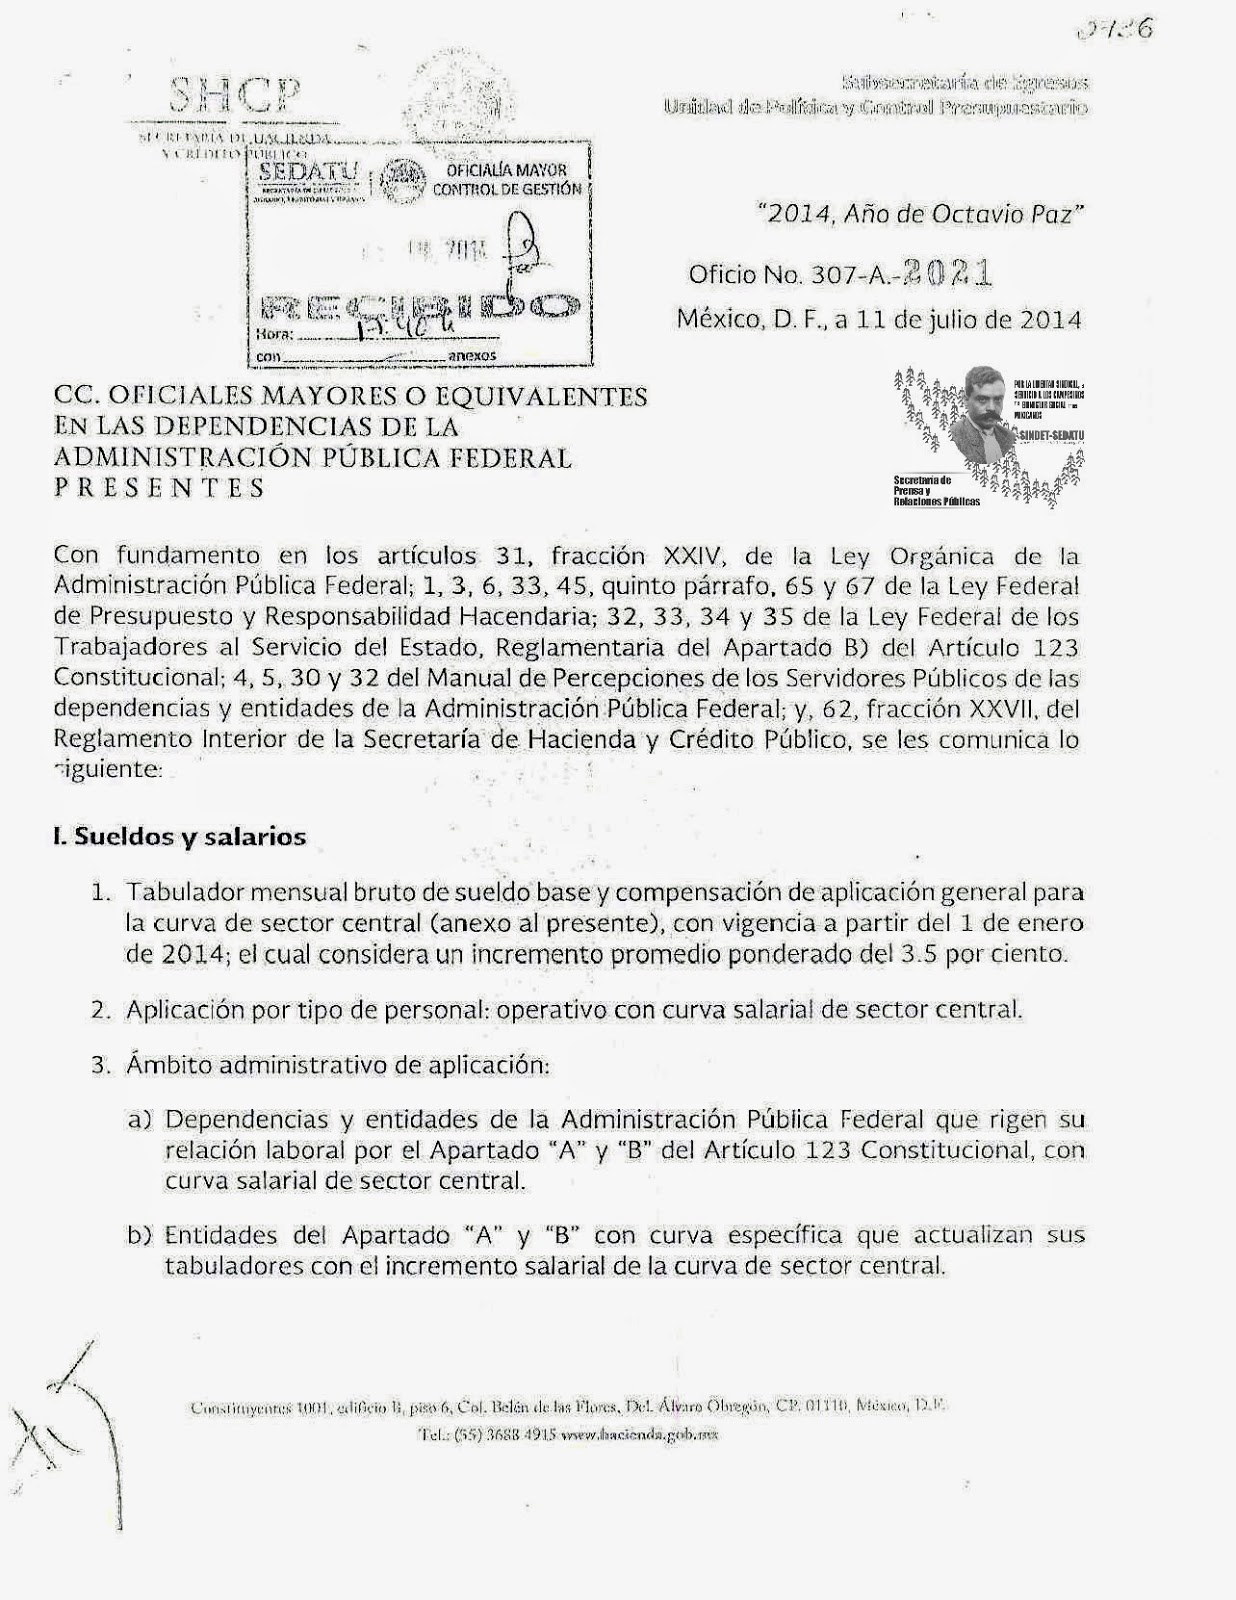 http://sindet-sedatu.org.mx/web/doctos/tabulador_shcp_2014.pdf